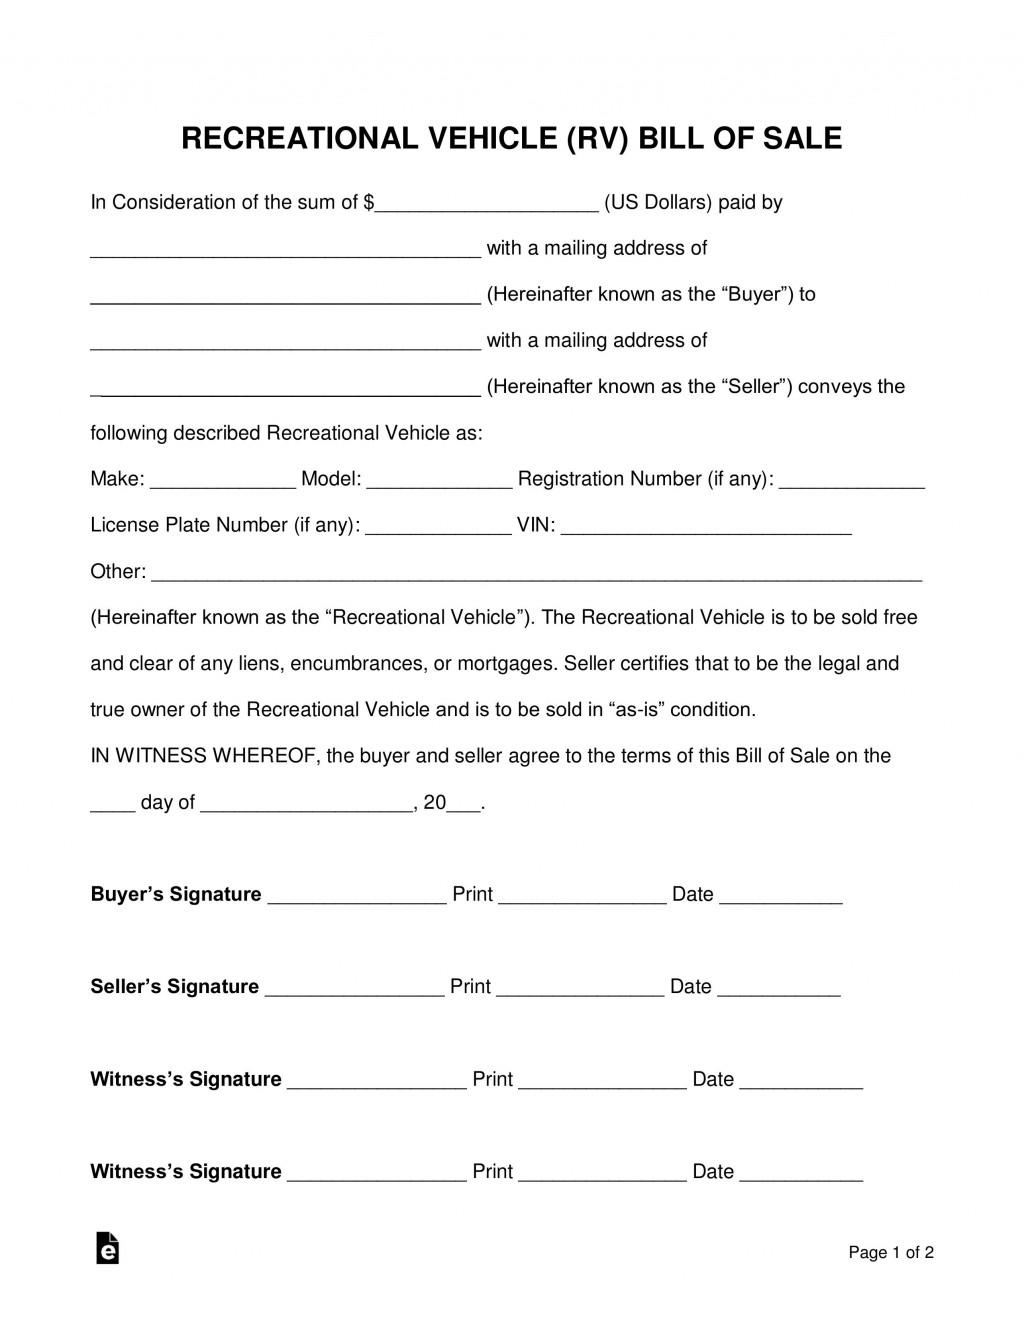 005 Frightening Bill Of Sale Template Texa Design  Texas Free Car Form Dmv DocumentLarge